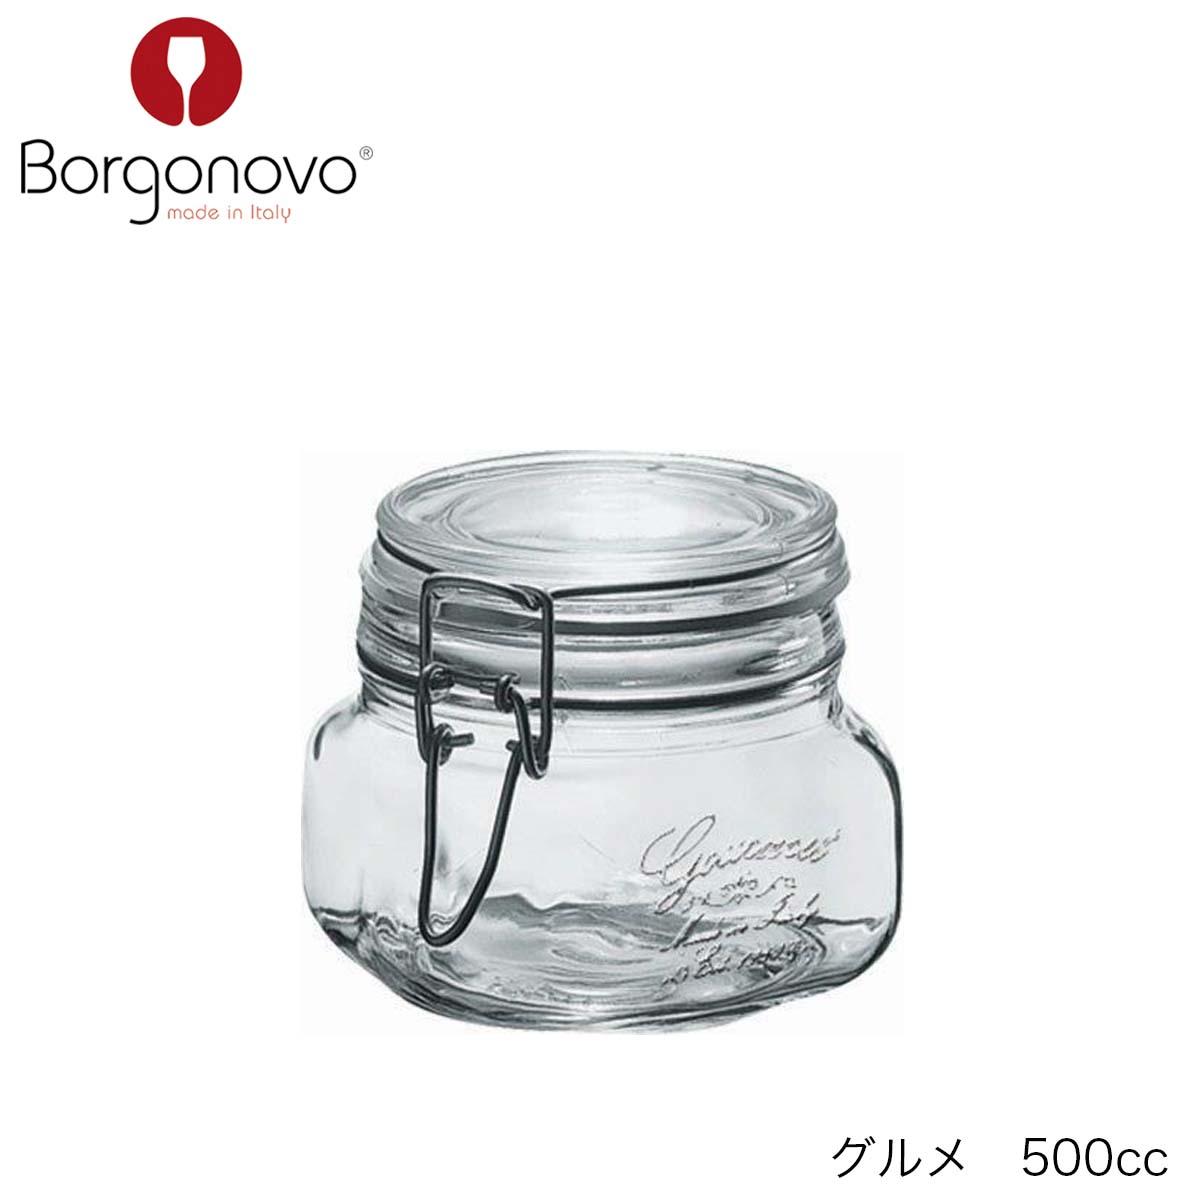 Borgonovo ボルゴノーヴォ グルメ 500 500ml イタリア製 10個セット